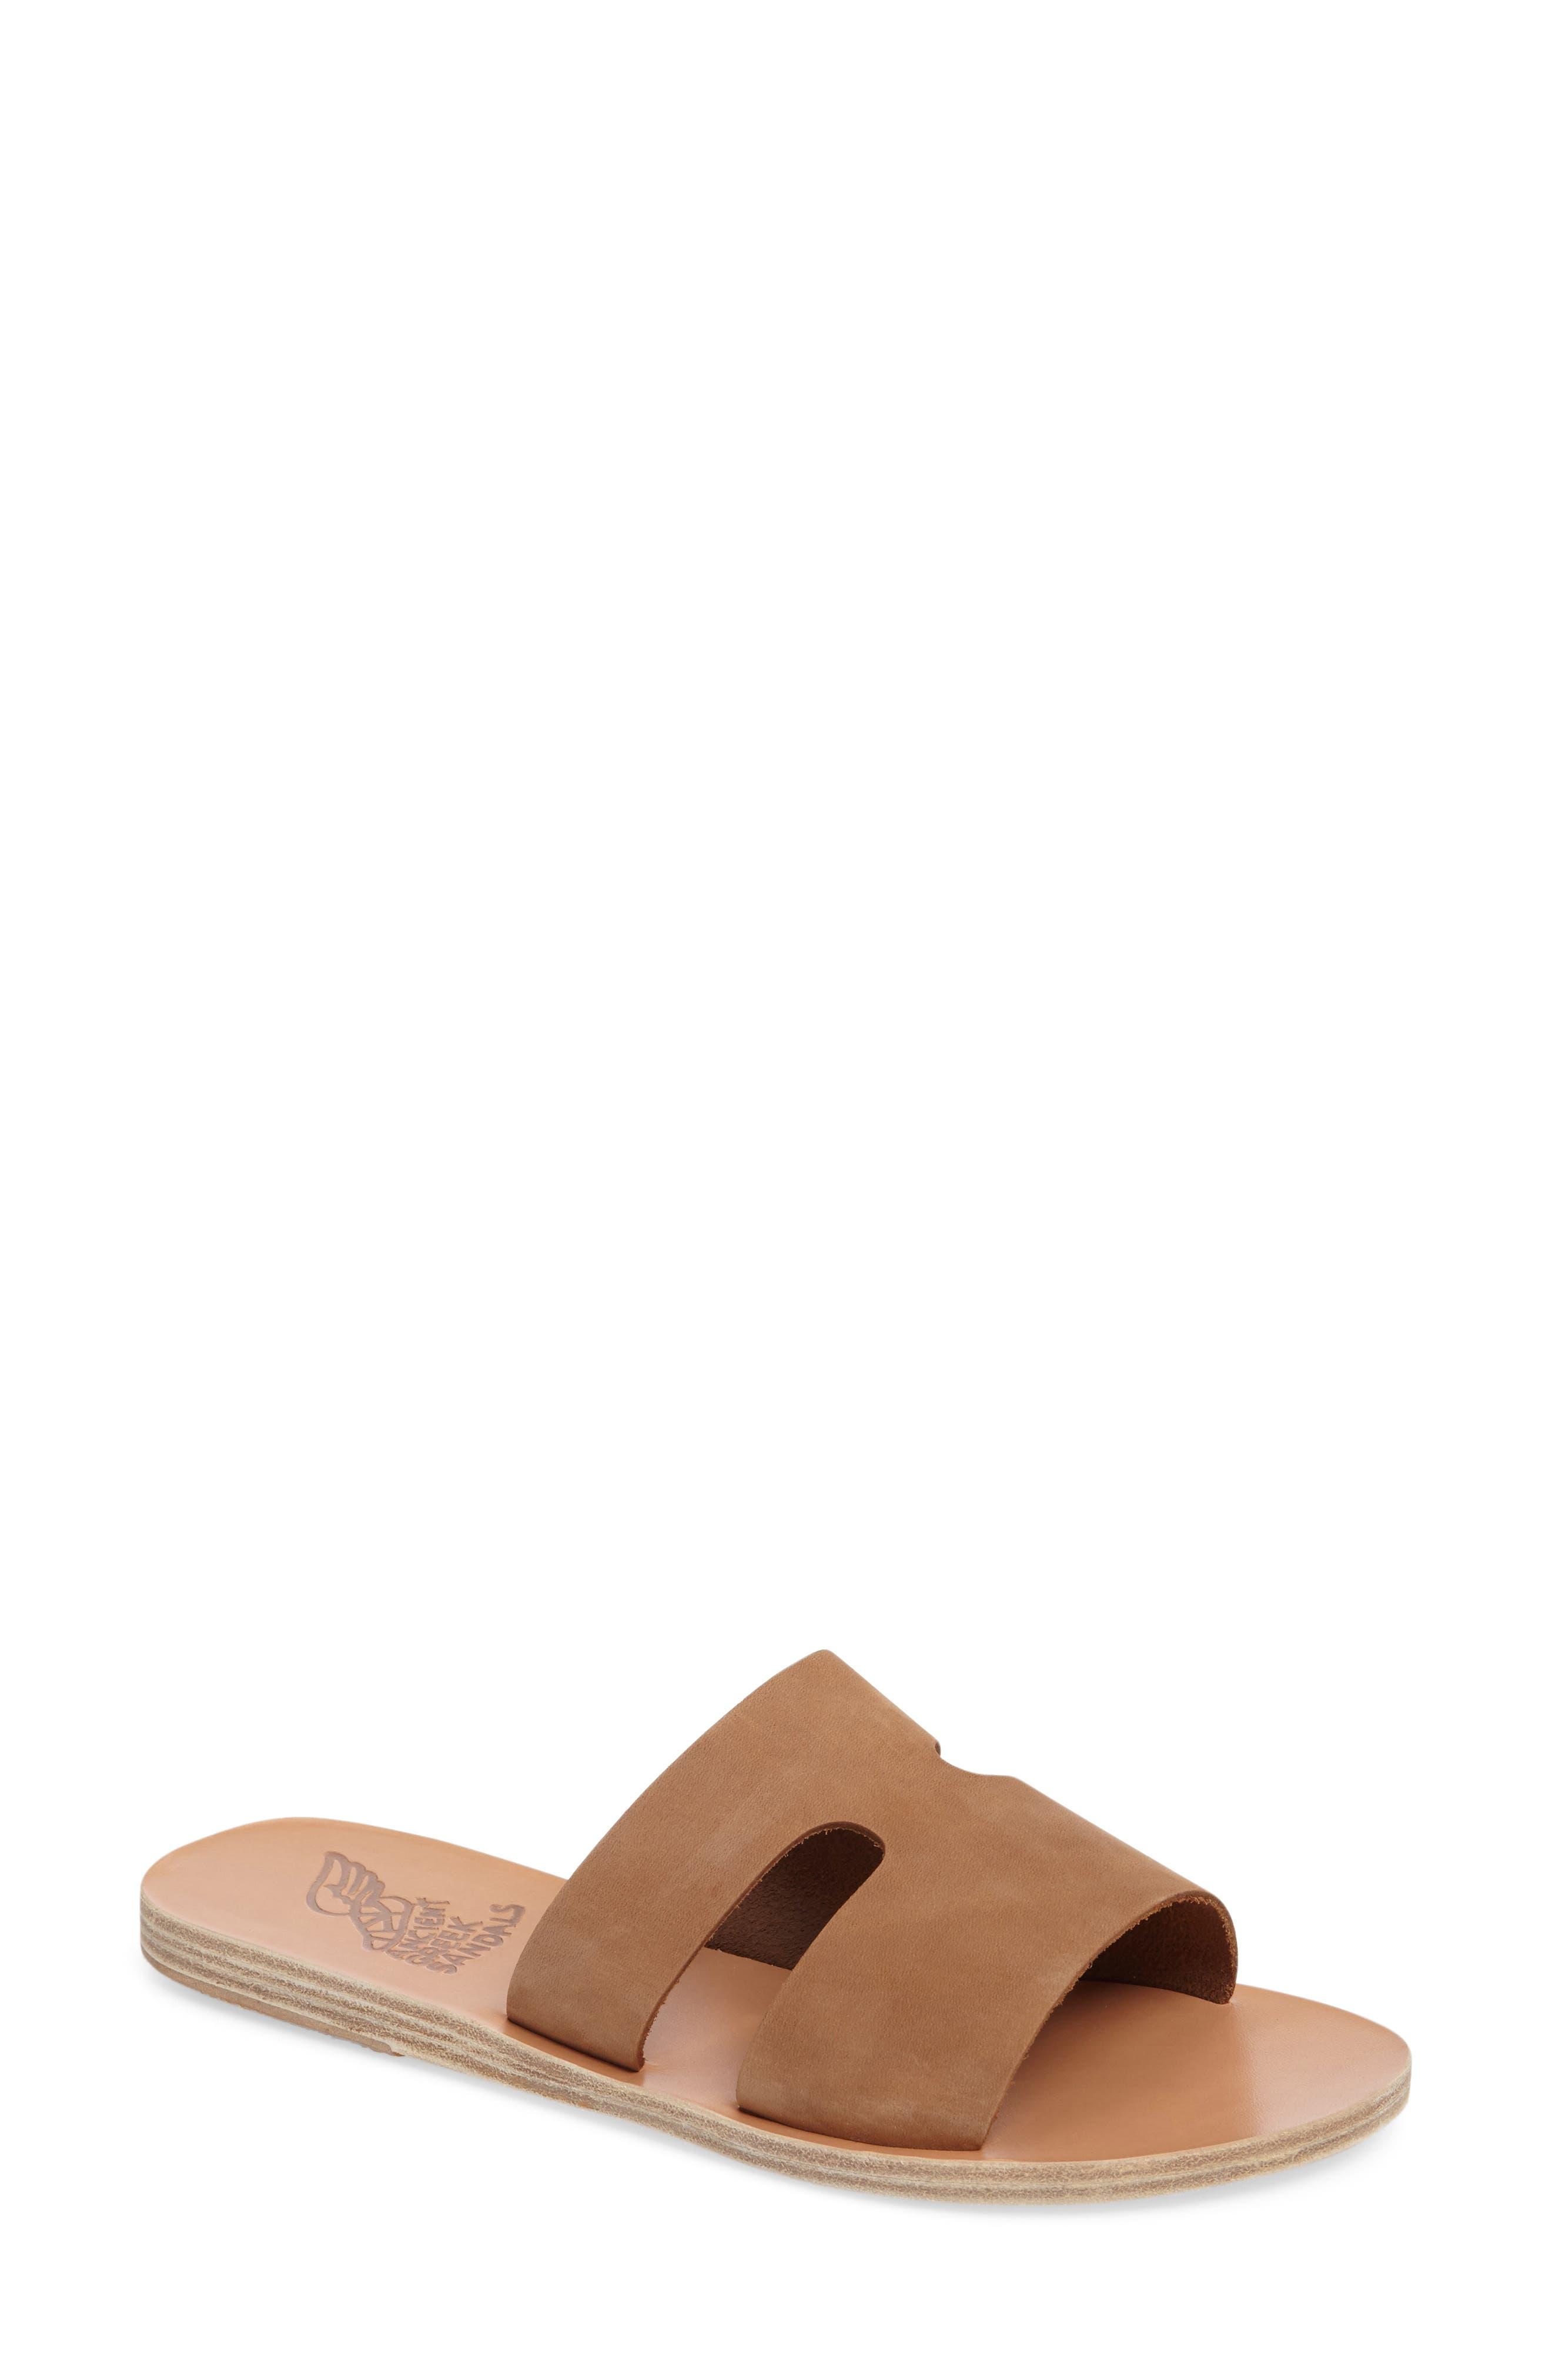 Alternate Image 1 Selected - Ancient Greek Sandals Apteros Slide Sandal (Women)